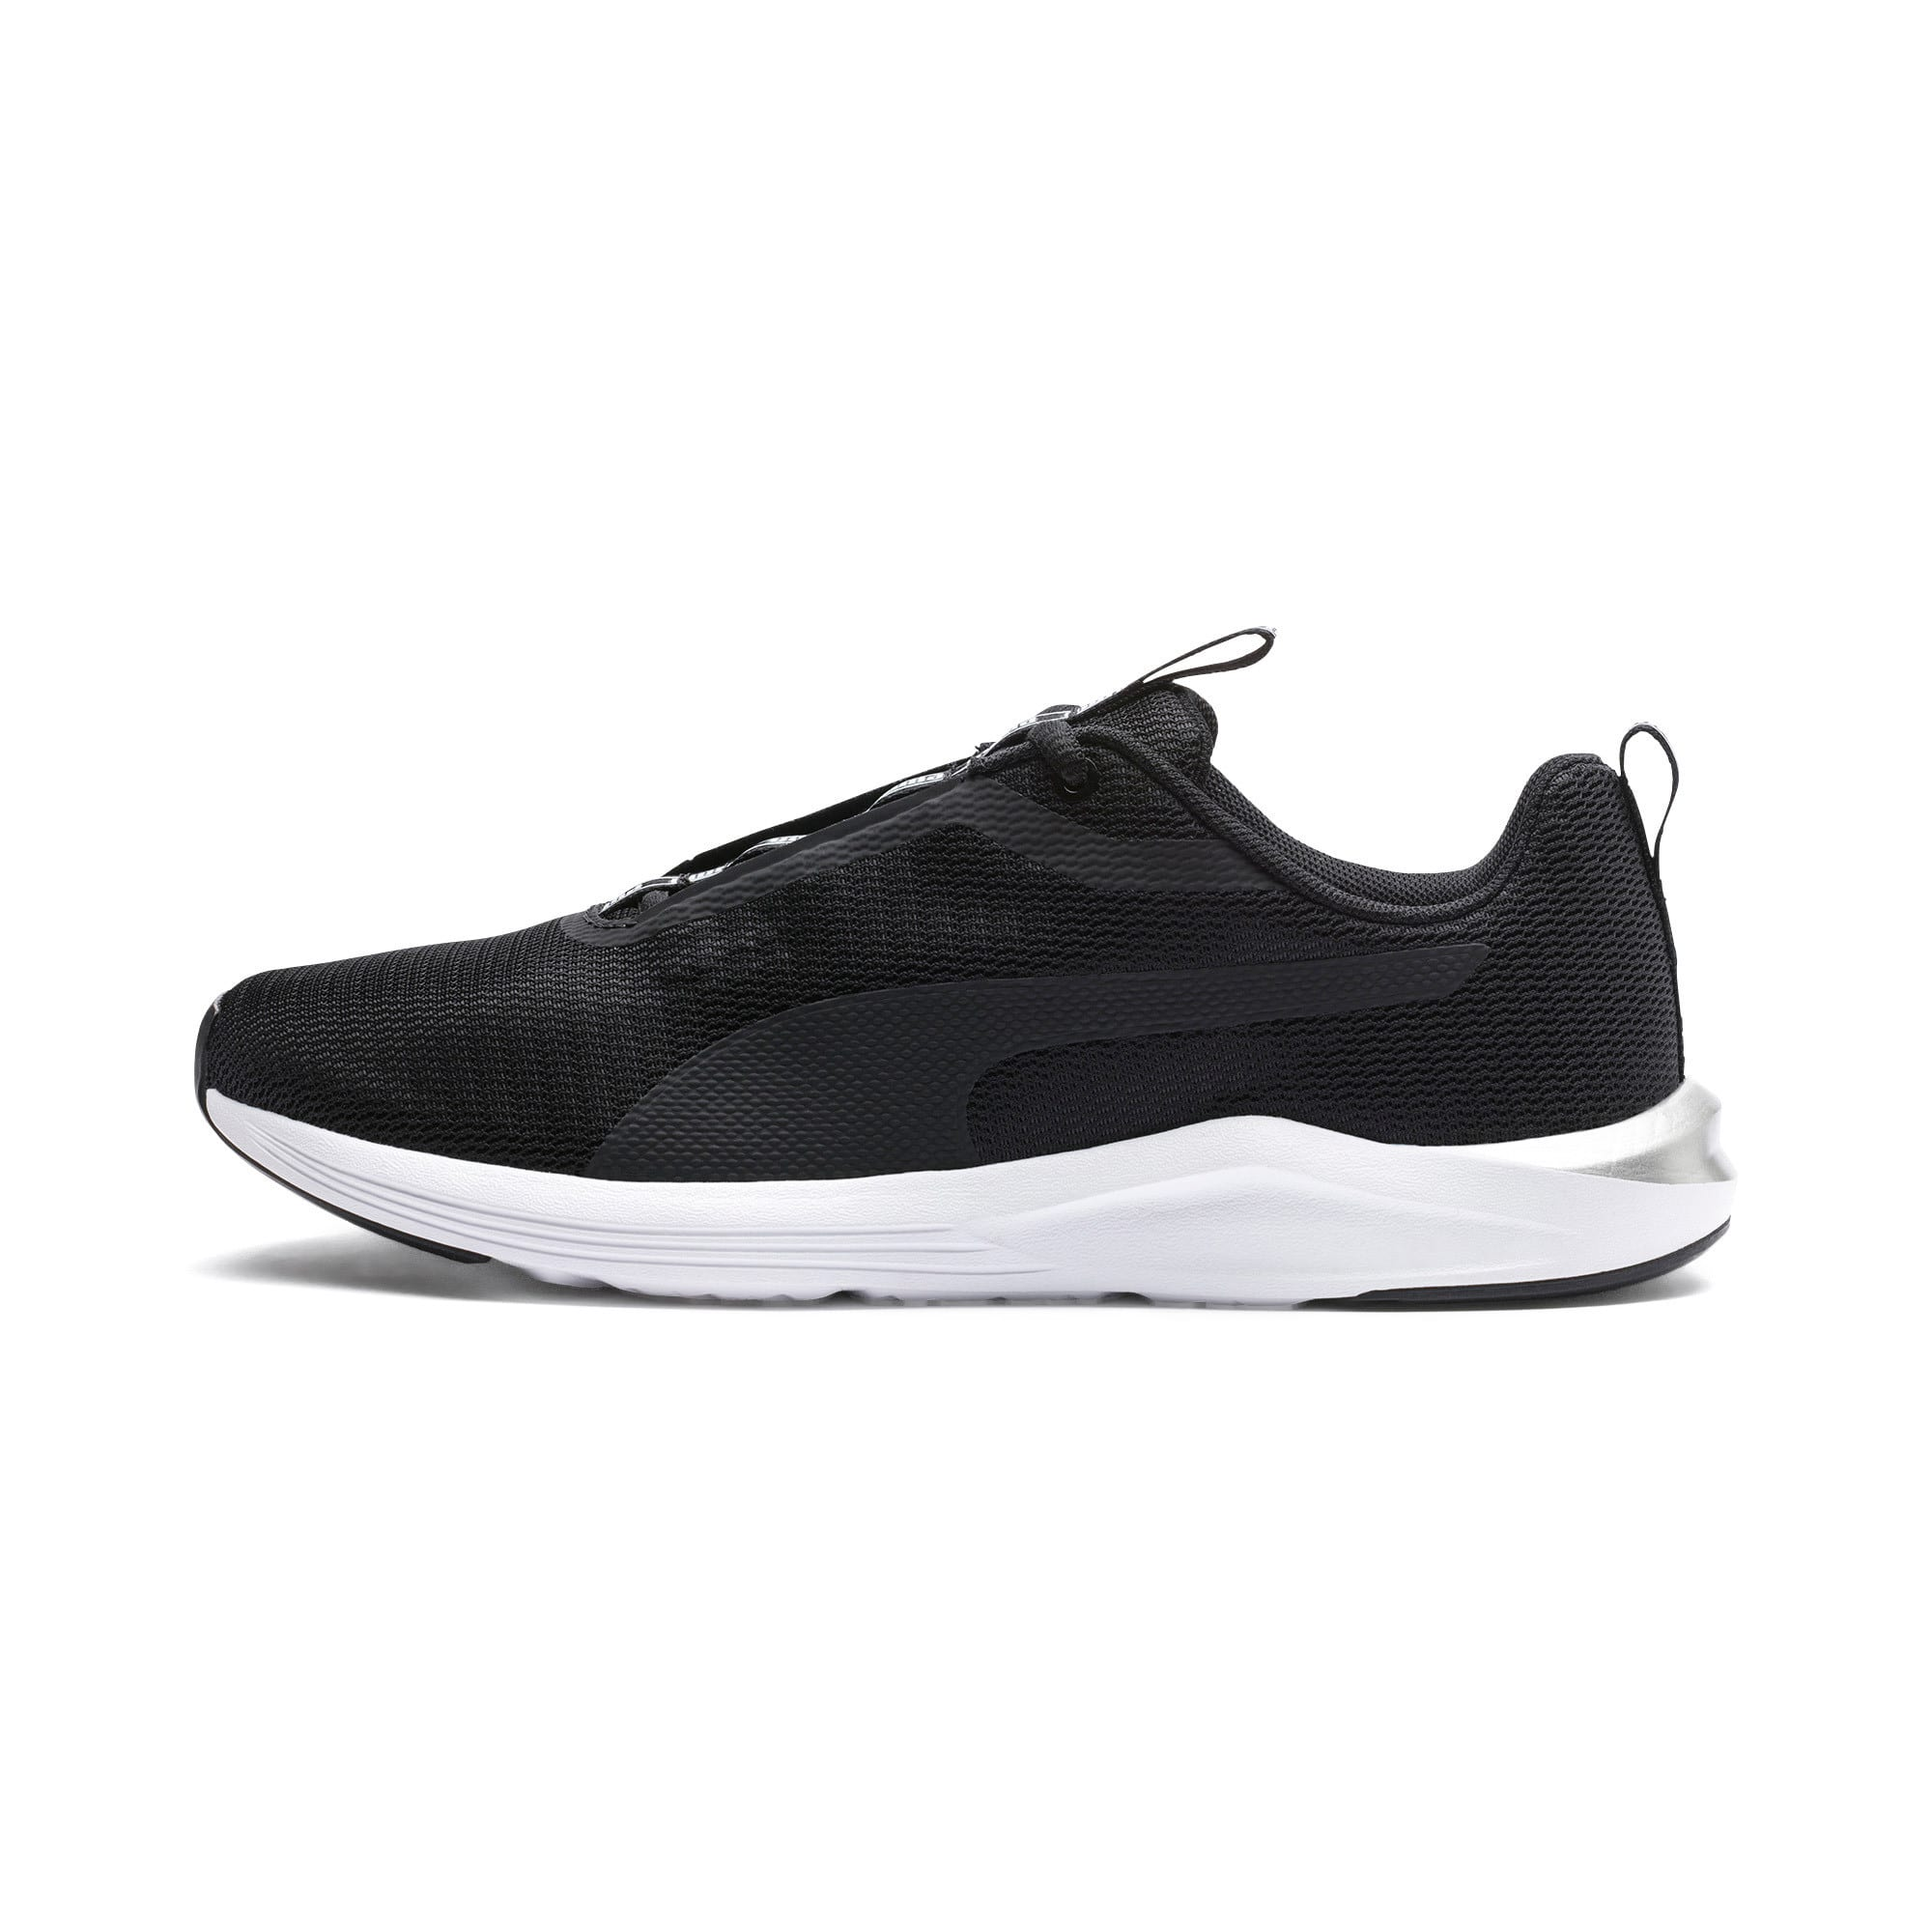 Thumbnail 1 of Prowl 2 Women's Training Shoes, Puma Black-Puma White, medium